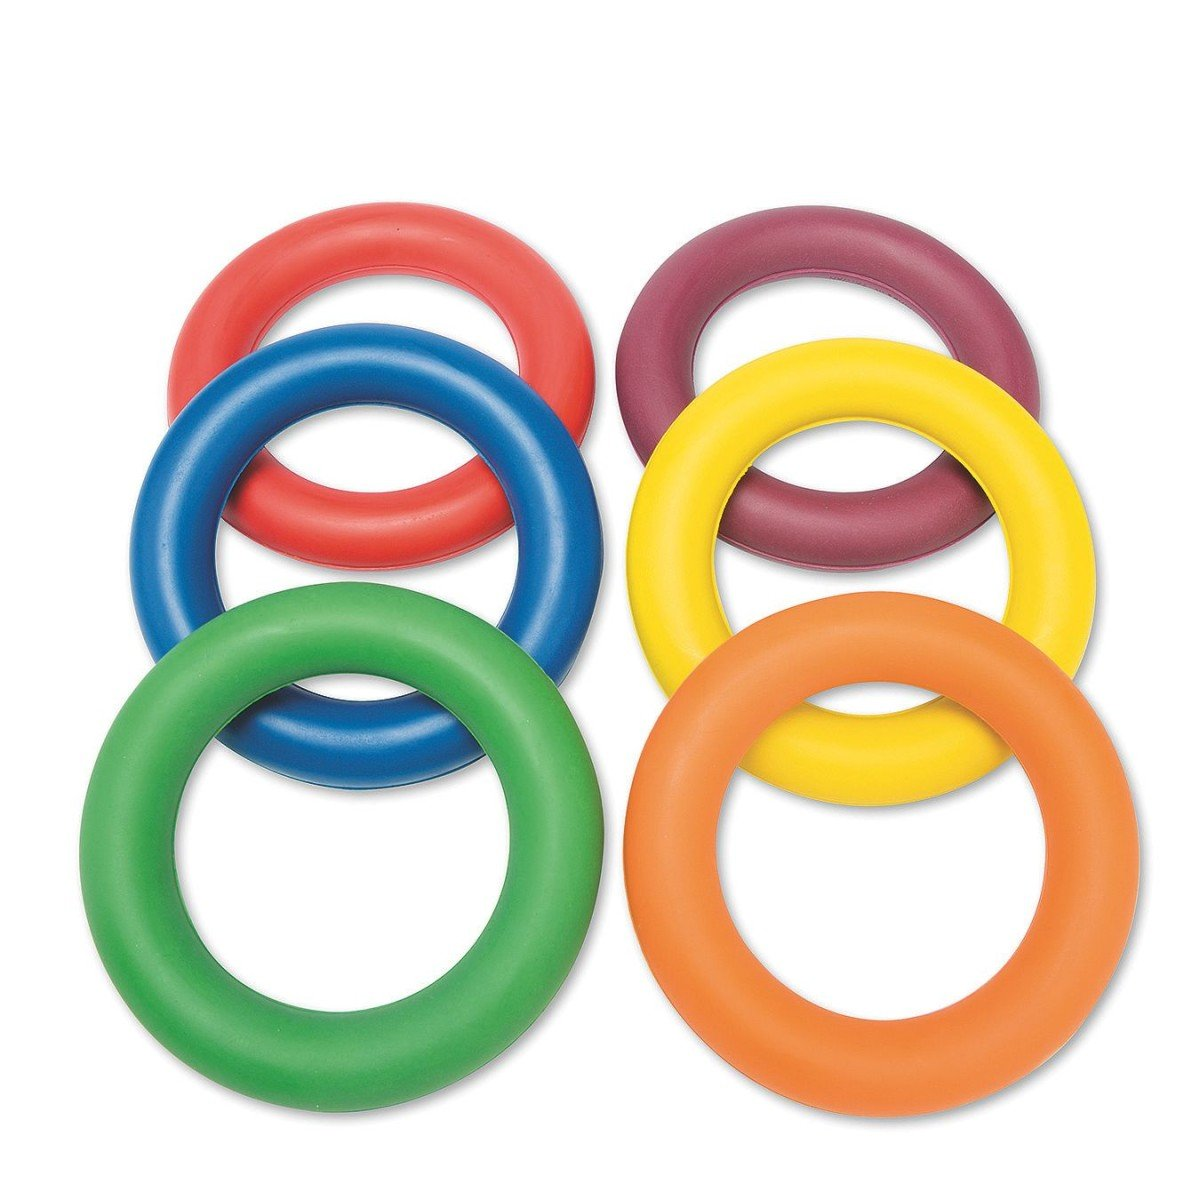 Rubber Deck Rings by S&S Worldwide